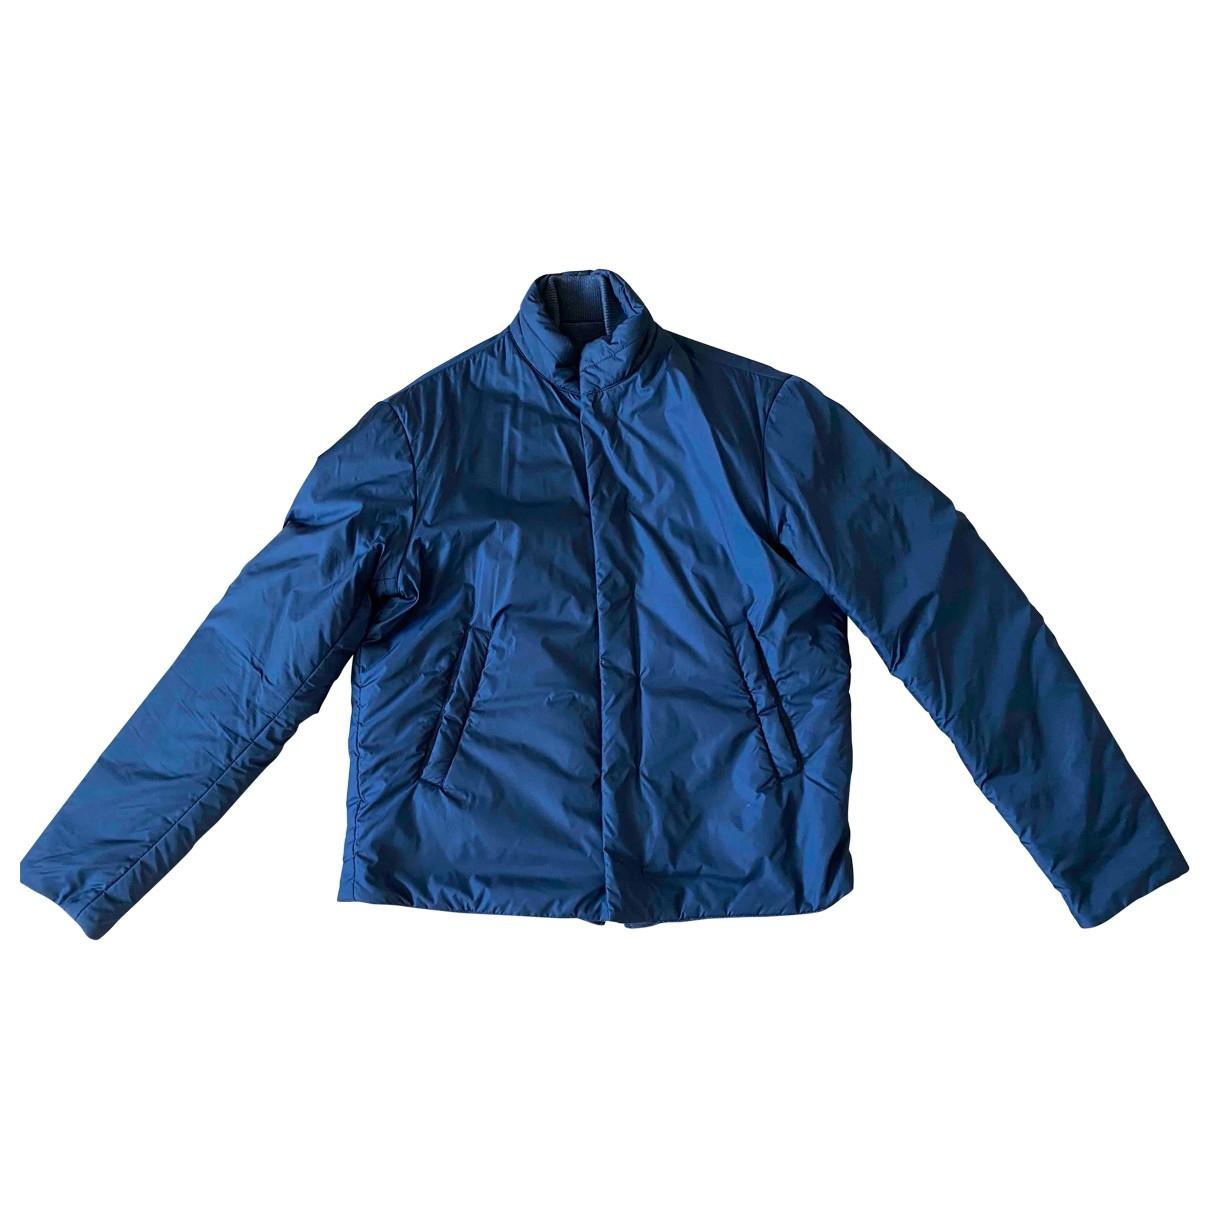 Emporio Armani \N Jacke in  Marine Polyester